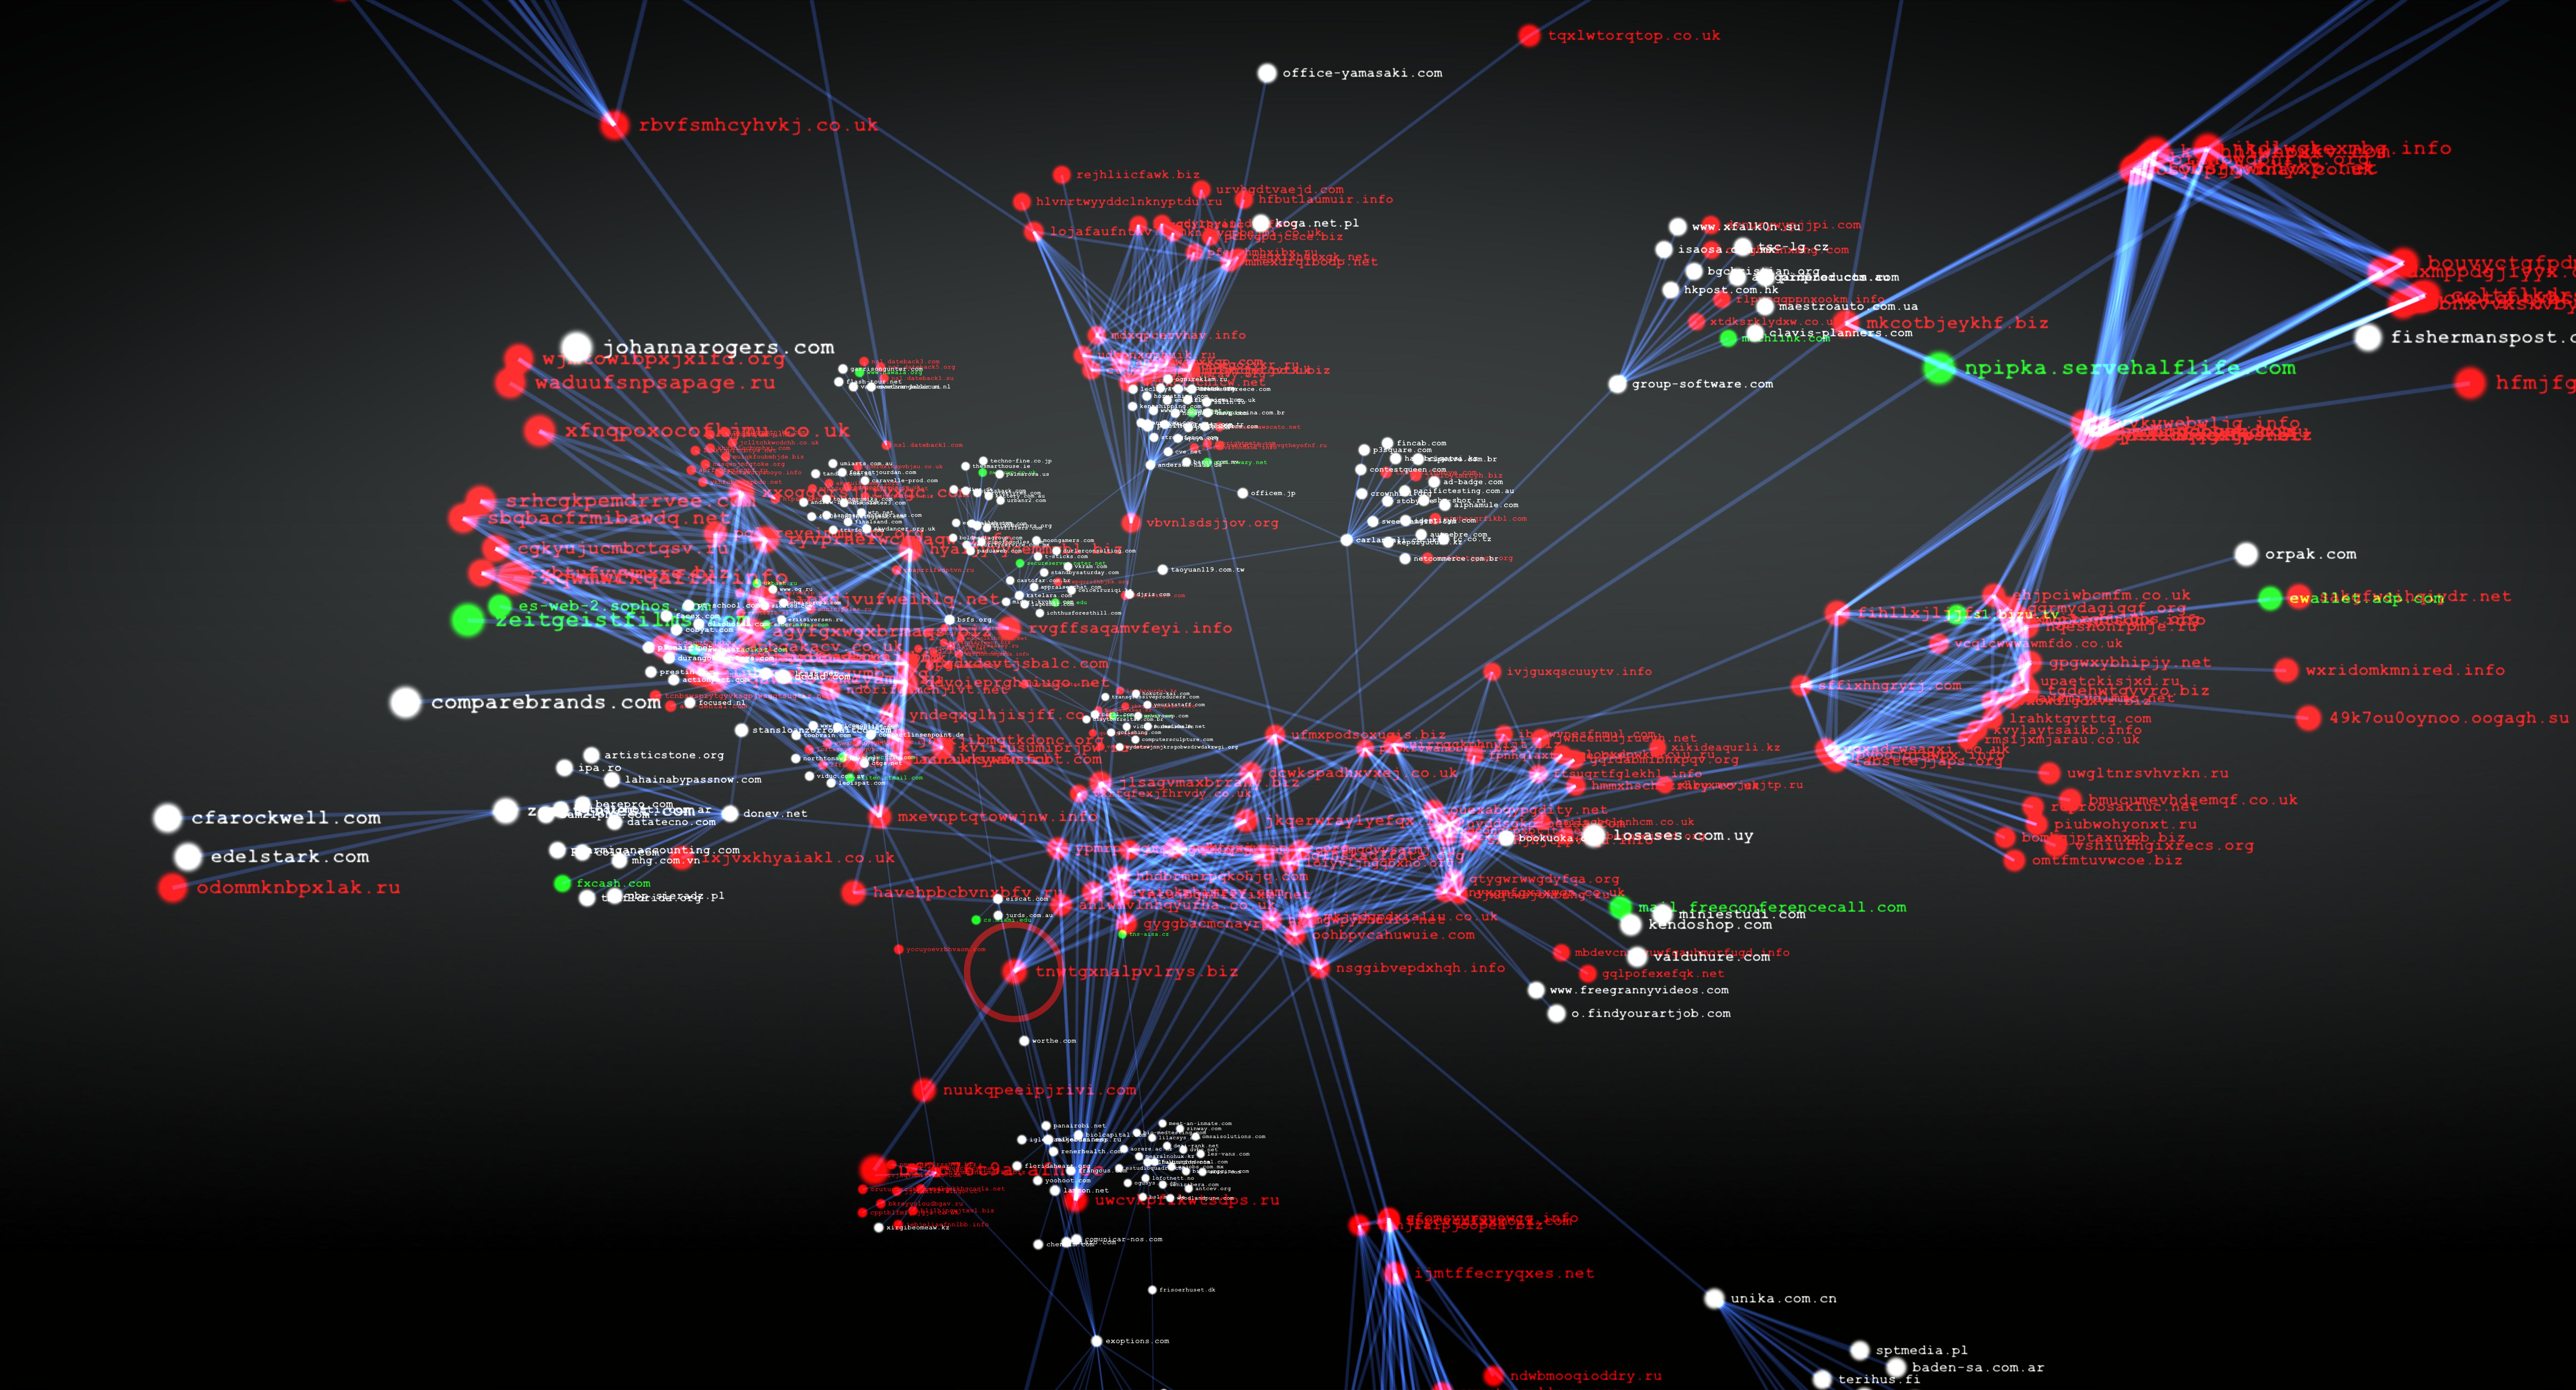 Pin by Preform IO on datavis Hacker wallpaper, Computer